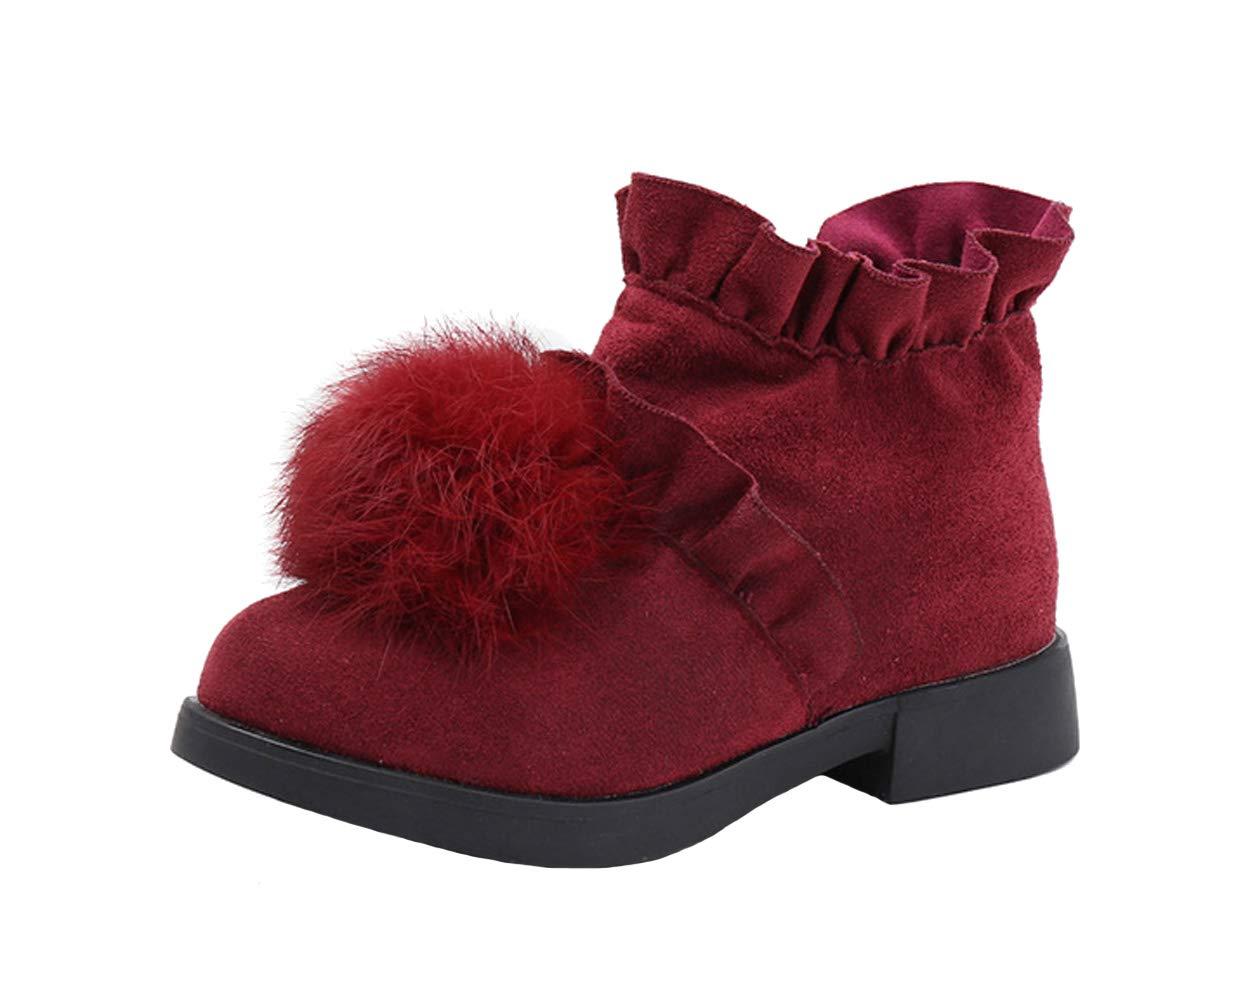 WUIWUIYU Girls' Sweet Zipper Short Ankle Boots Casual Walking Princess Shoes Dark Red Size 9.5 M